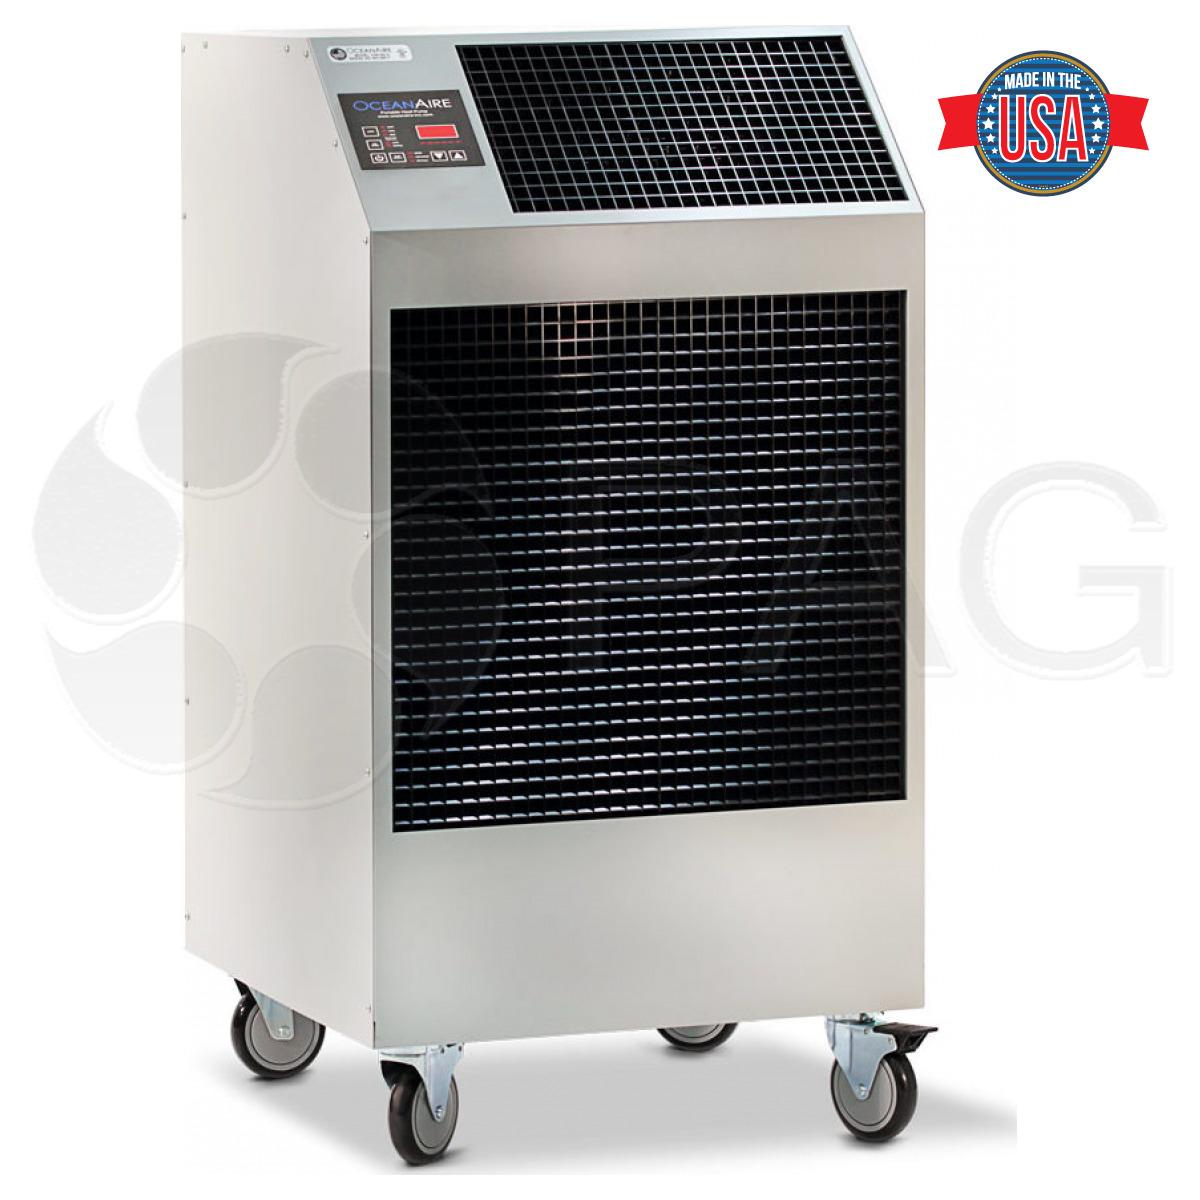 OceanAire OWC6012 portable air conditioner